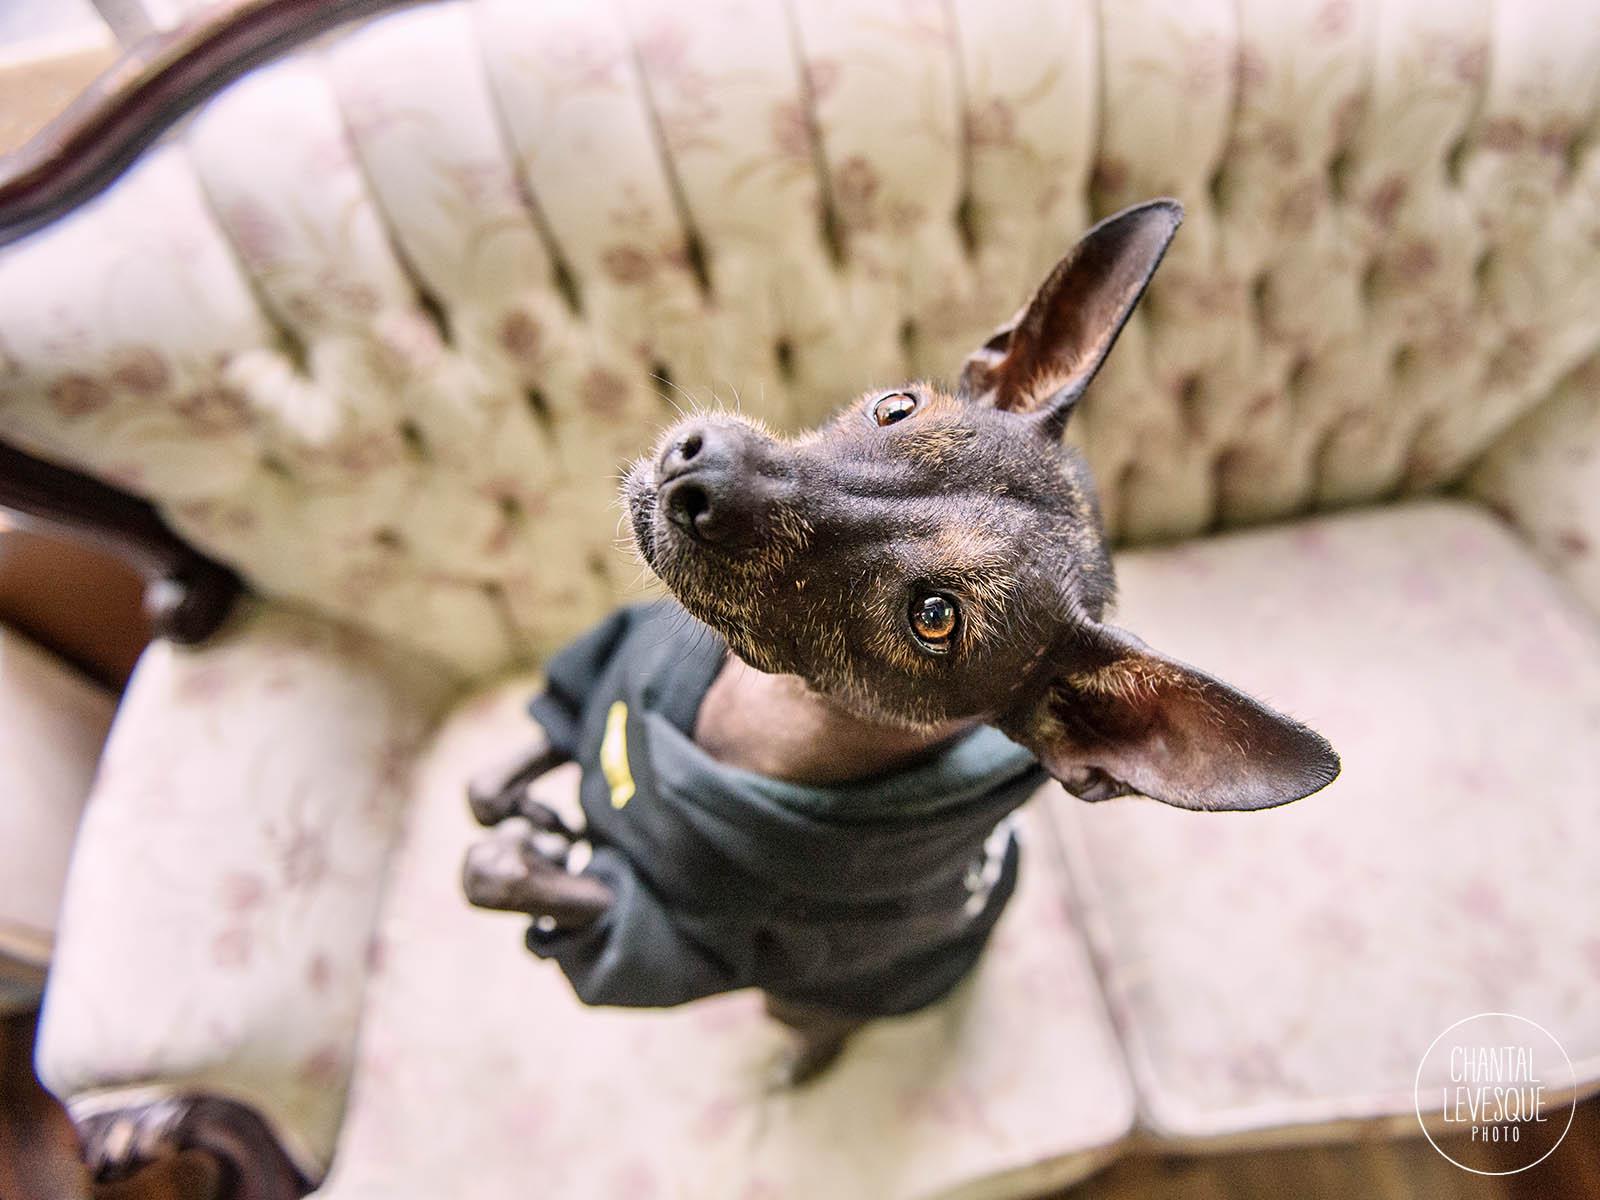 doggy-calendrier-Etrange-8776-web.jpg